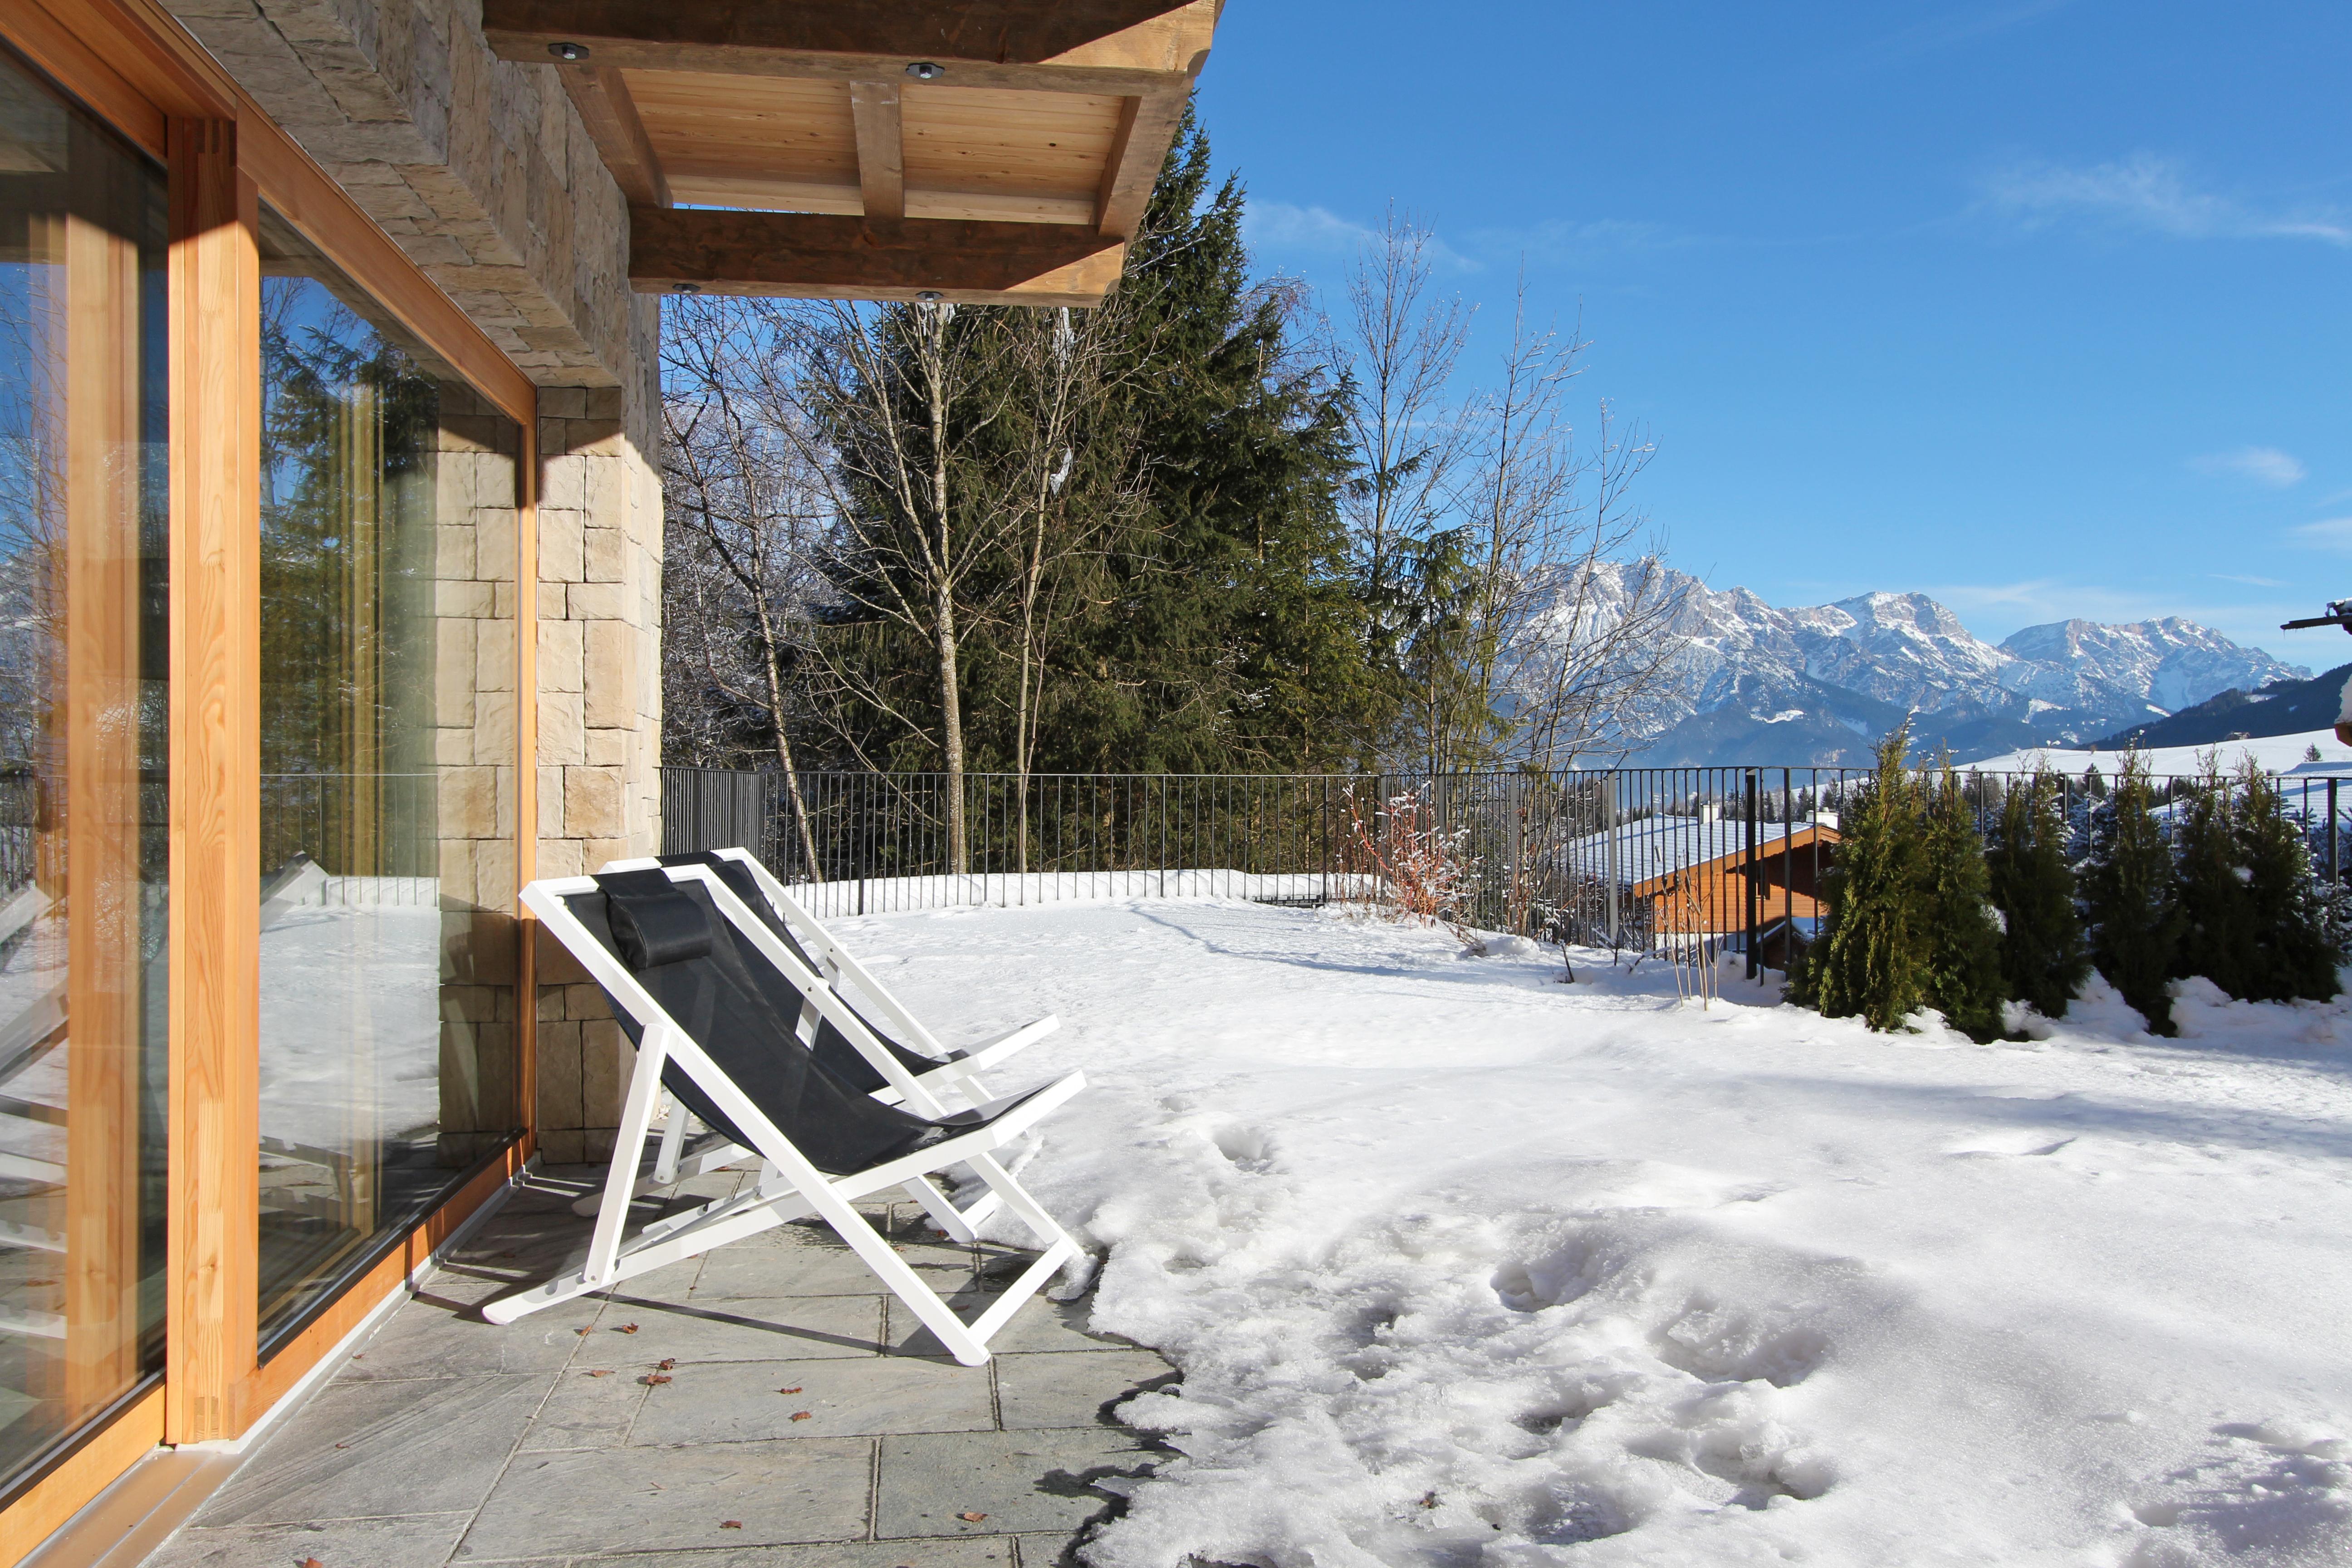 Winter Sonne Apartment 2 Mountain Lodge Leogang